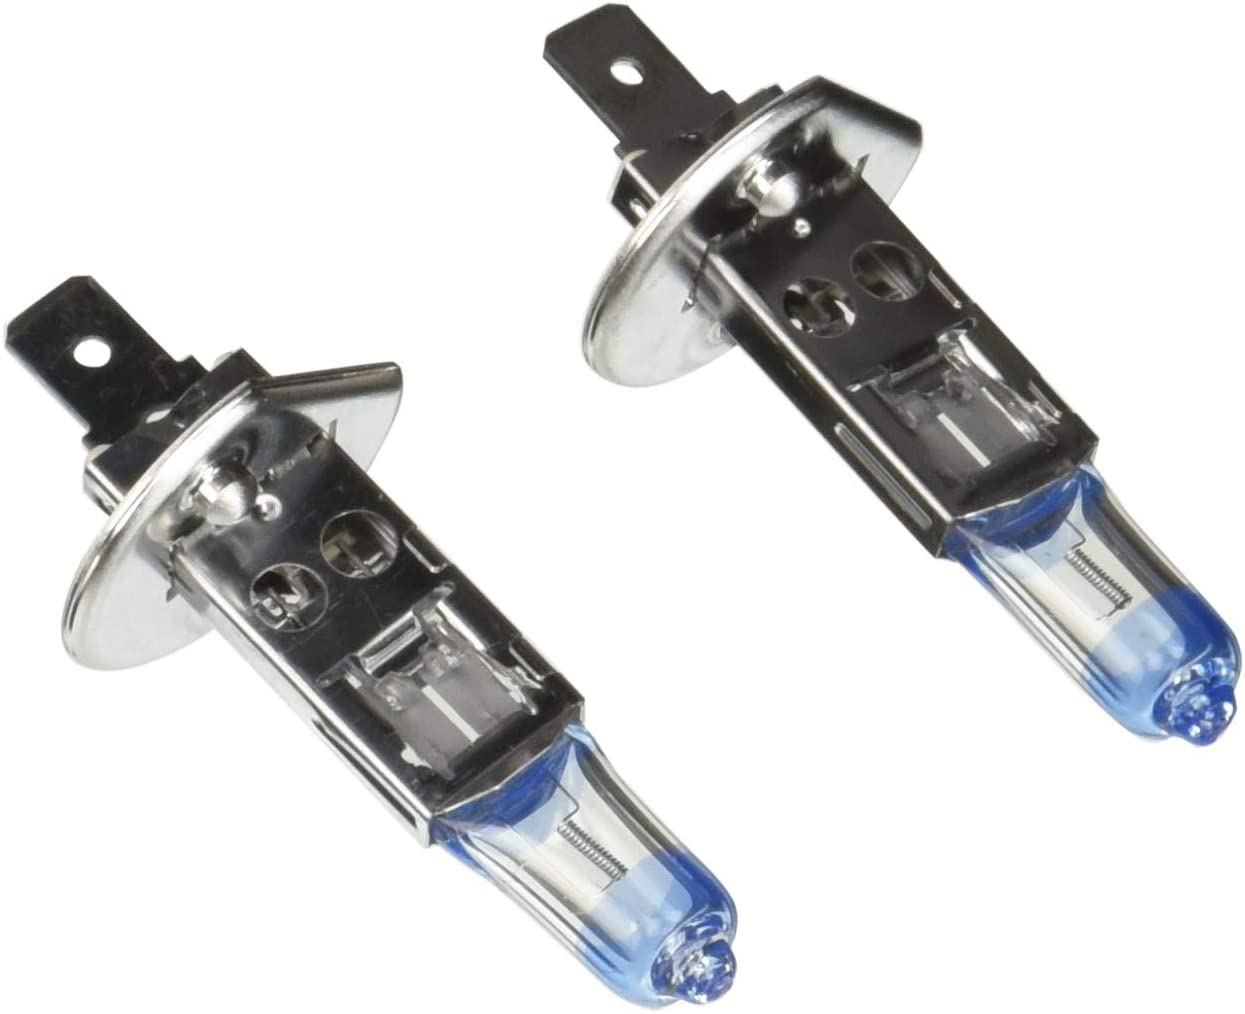 2/unidades estuche doble autom/óvil de 12/V OSRAM NIGHT BREAKER UNLIMITED H4 l/ámpara para faros hal/ógena 64193NBU-HCB